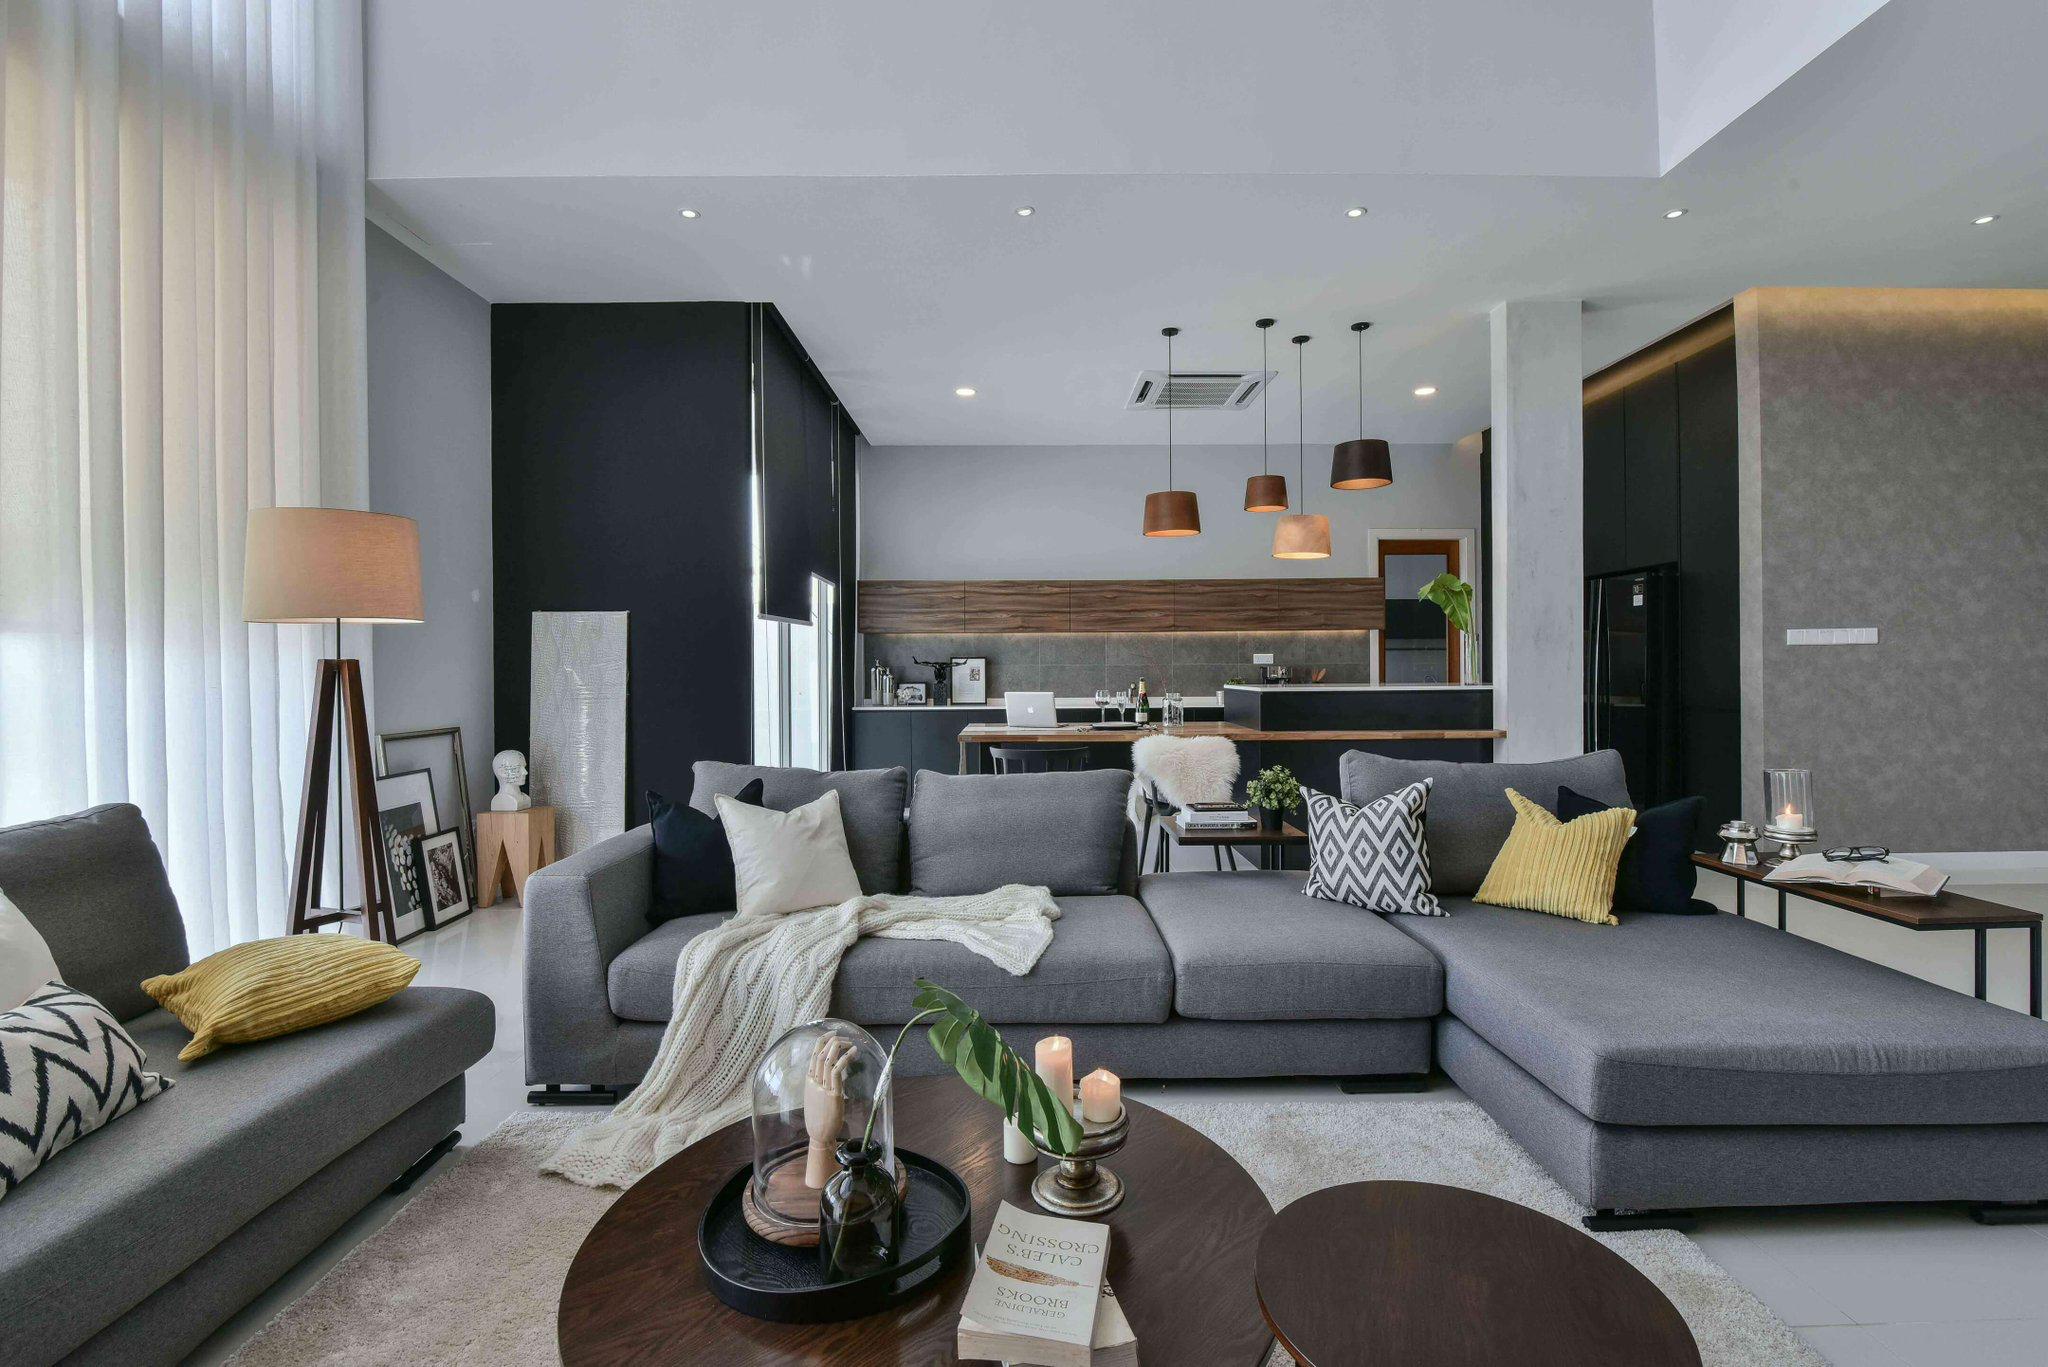 Pin by lee harris on layoutus kitchen living pinterest